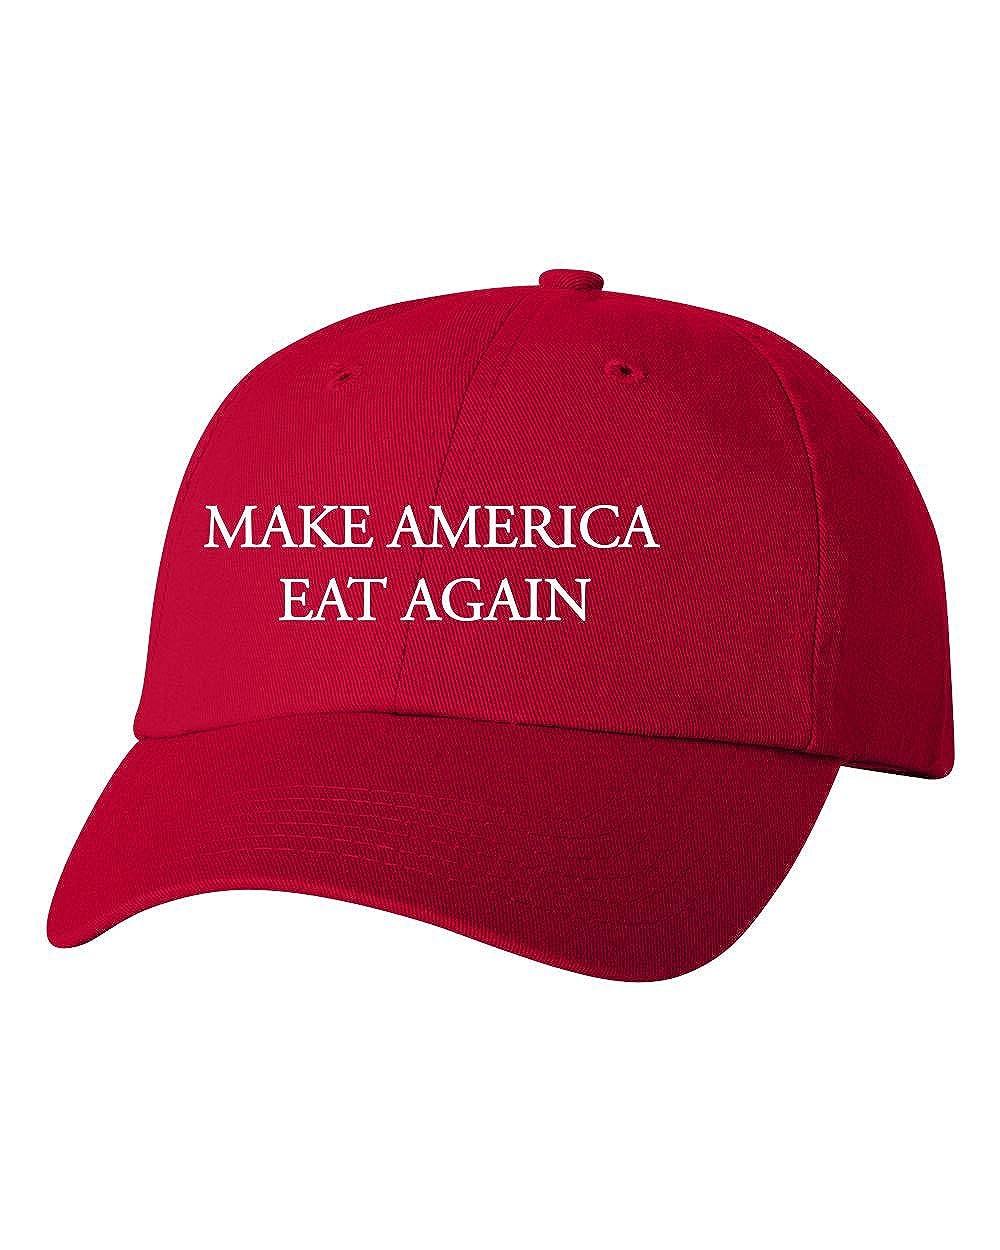 Custom Make America Eat Again Dad Hat Cap Baseball Adjustable New - Red at Amazon Mens Clothing store: